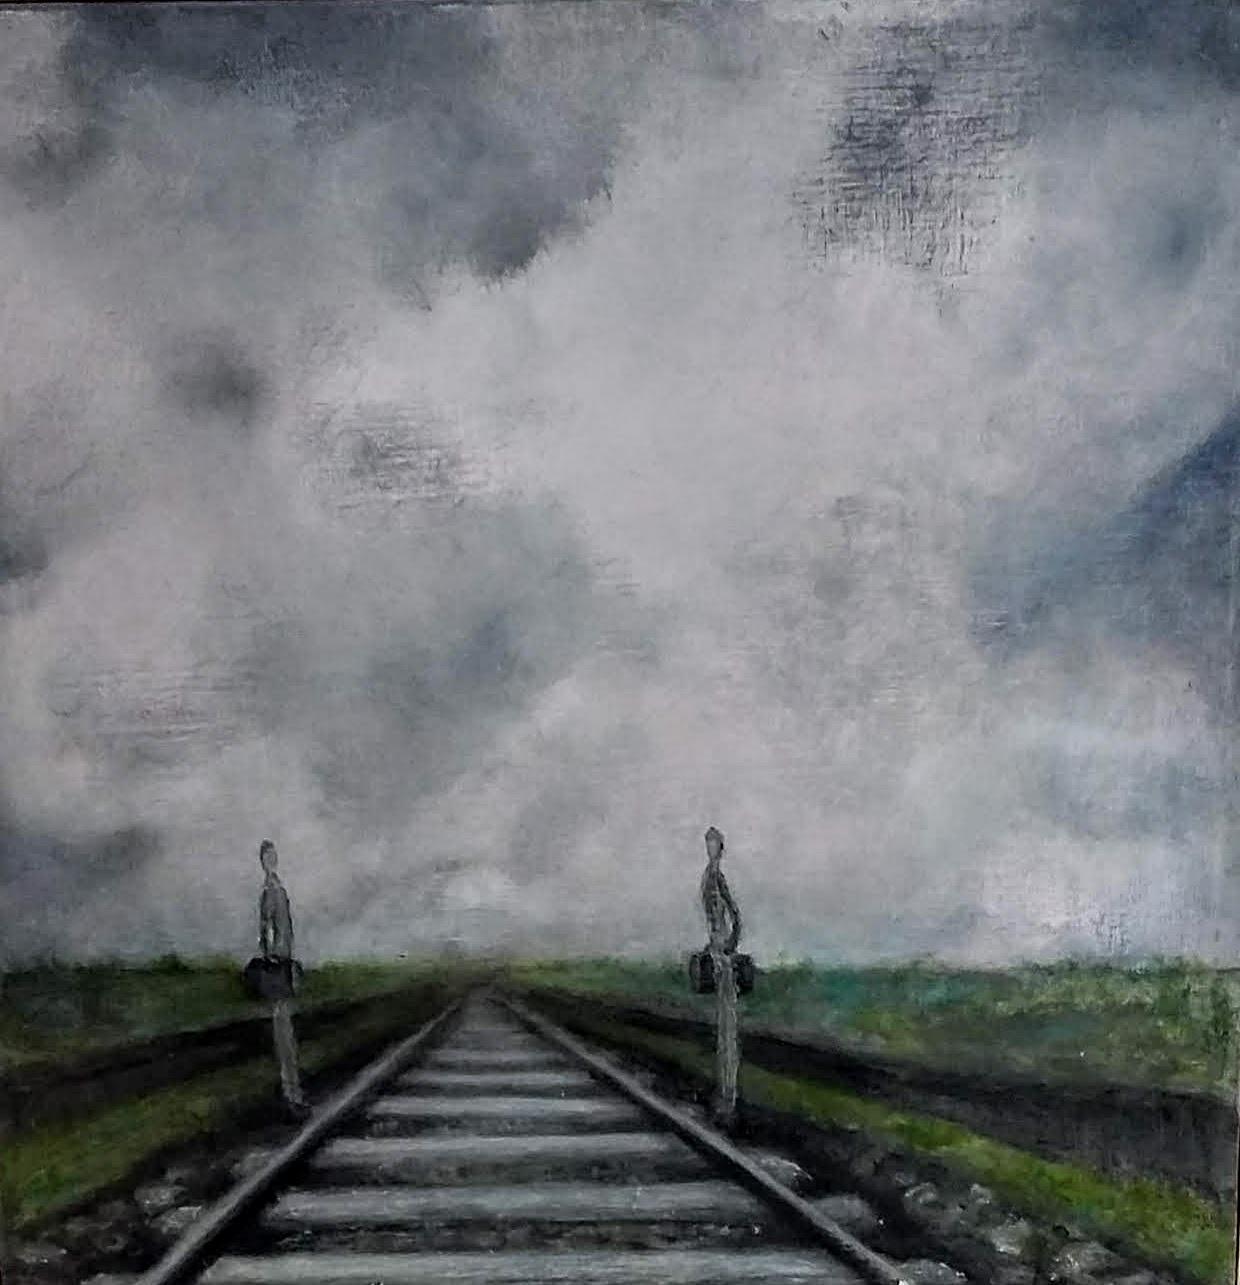 'Last train'